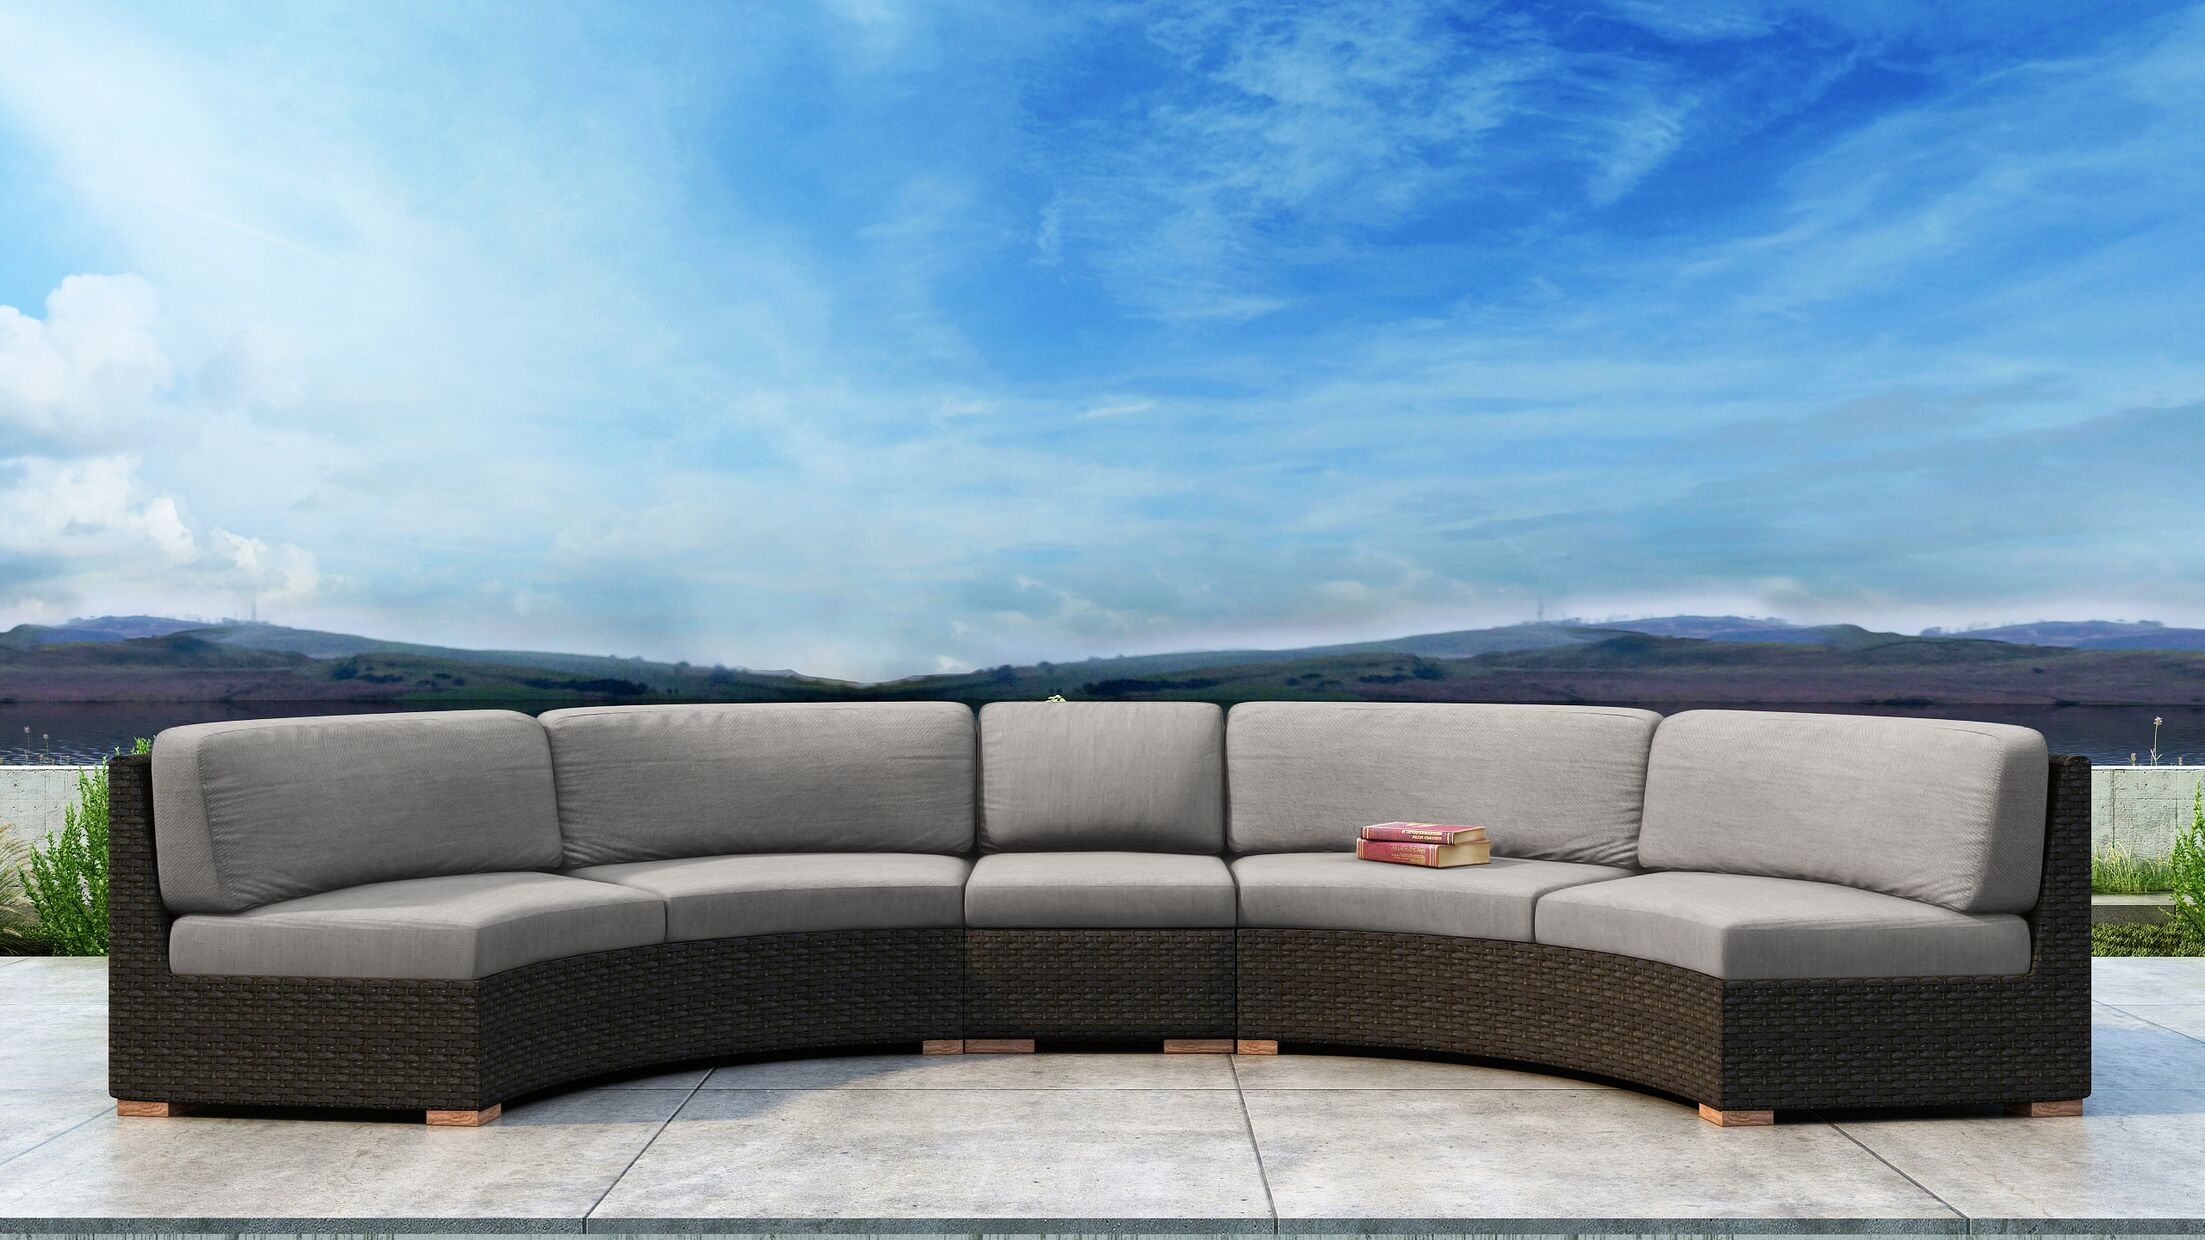 Glen Ellyn 3 Piece Sectional Set with Sunbrella Cushion Cushion Color: Cast Silver